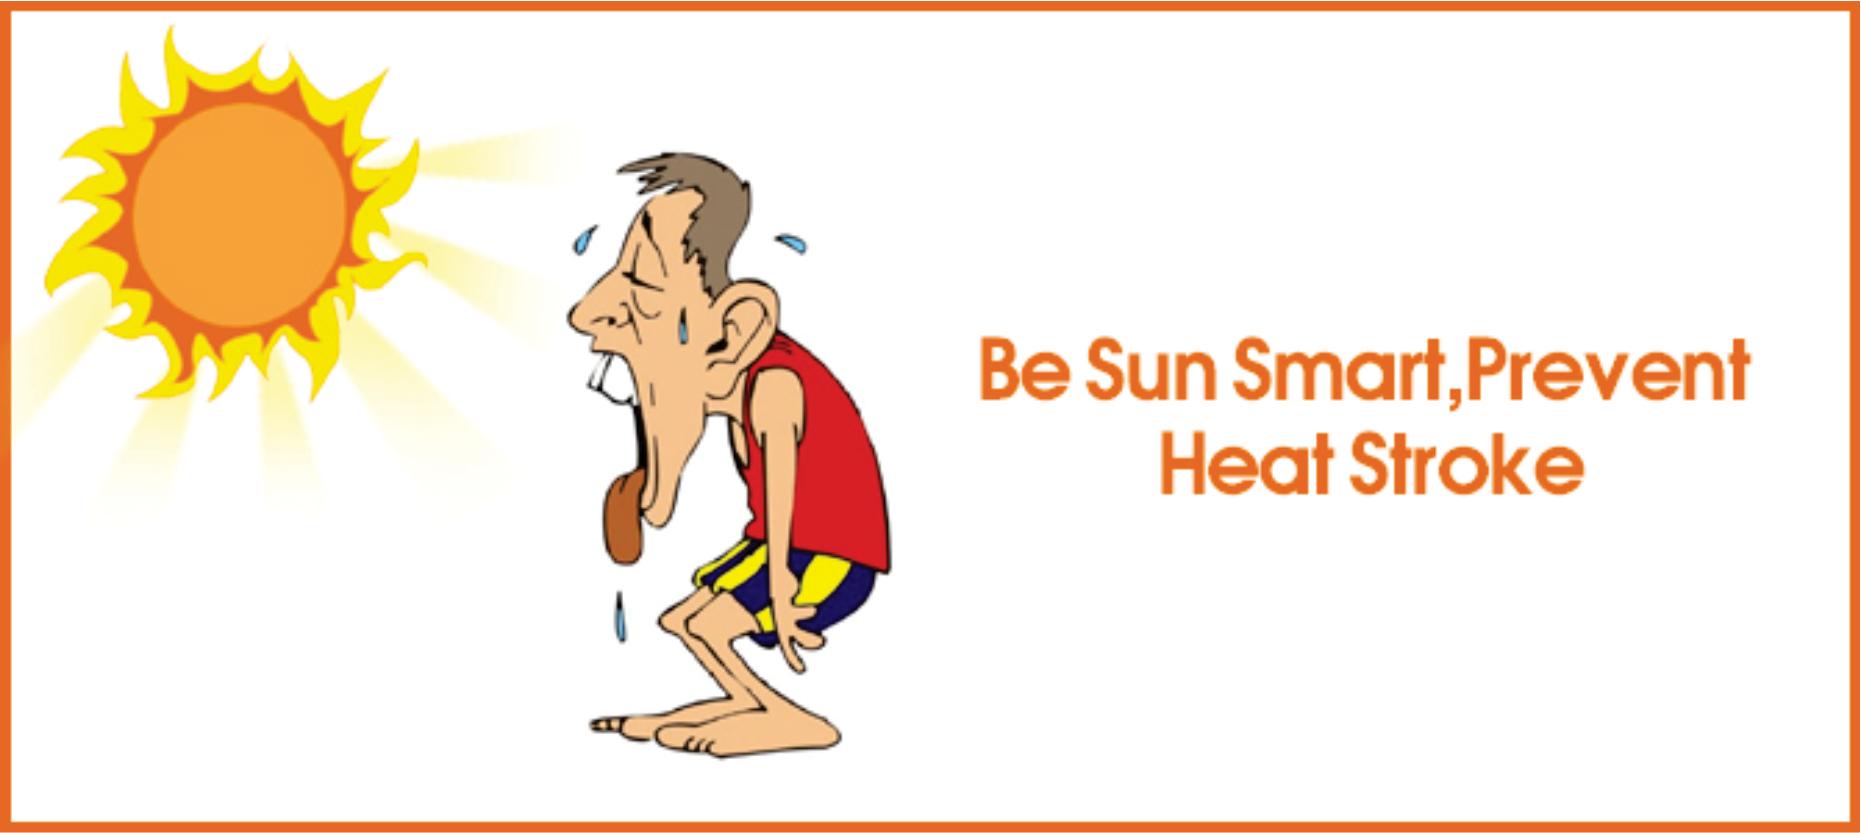 Be Sun Smart, Prevent Heat Stroke